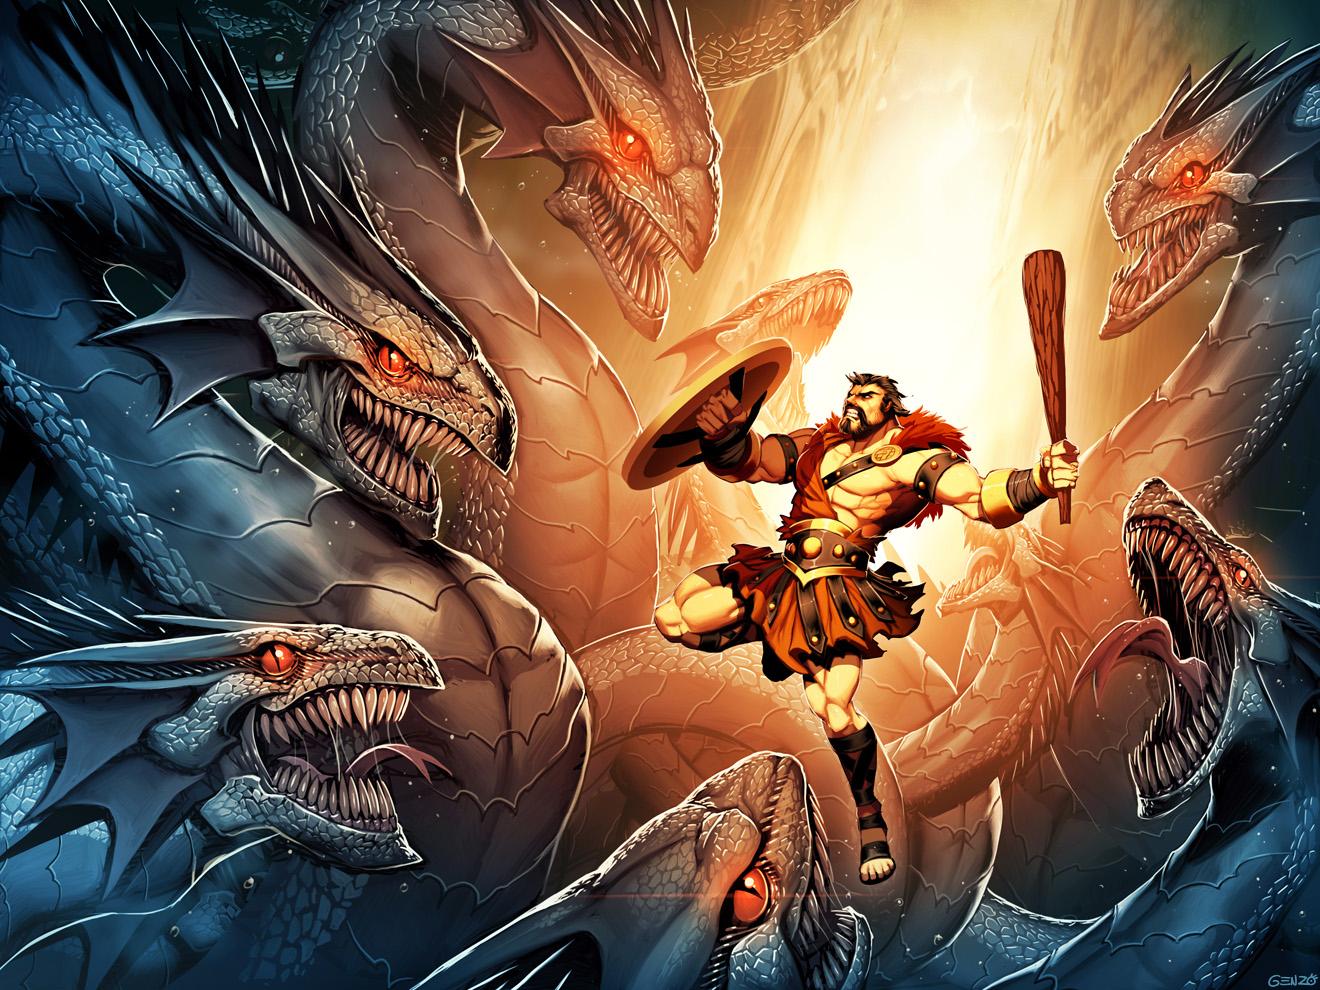 Hercules and Hydra by GENZOMAN on DeviantArt